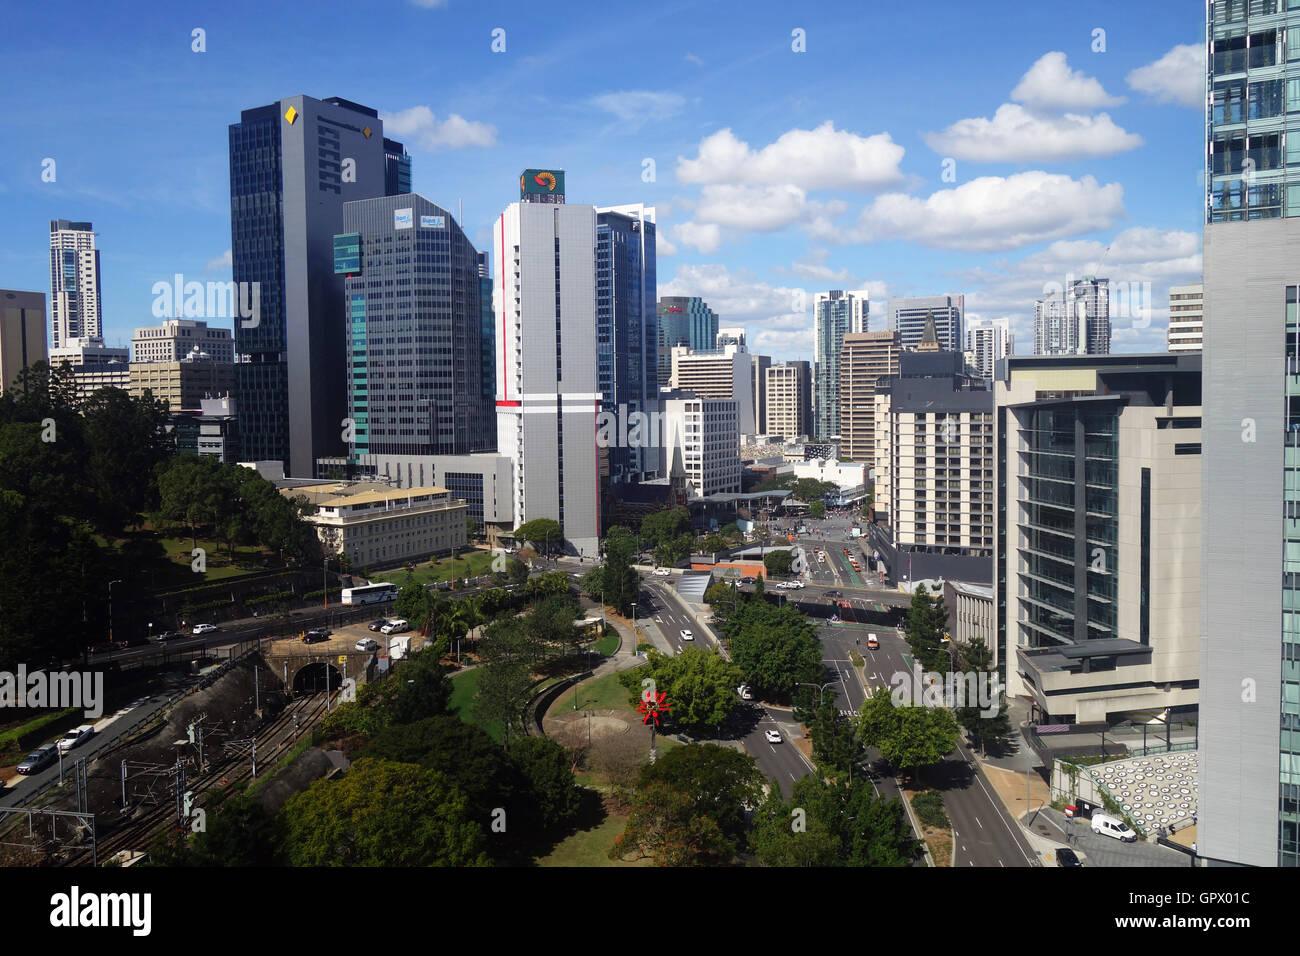 Looking along Roma Street towards King George Square, Brisbane CBD, Queensland, Australia. No MR or PR - Stock Image